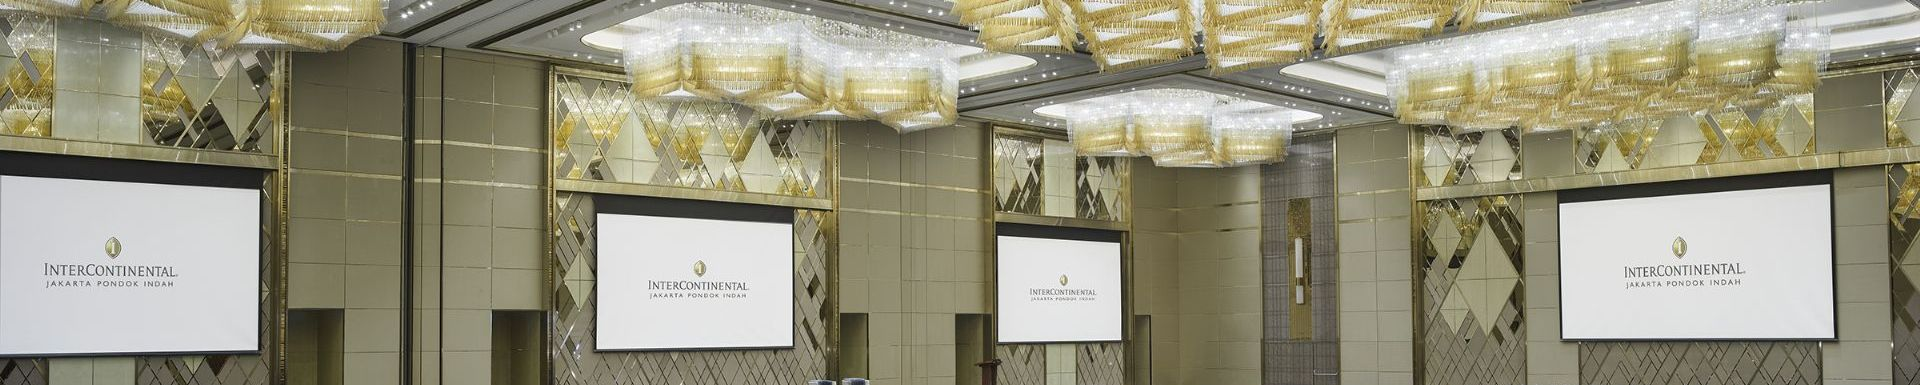 InterContinental Jakarta Pondok Indah Hotel & Residence